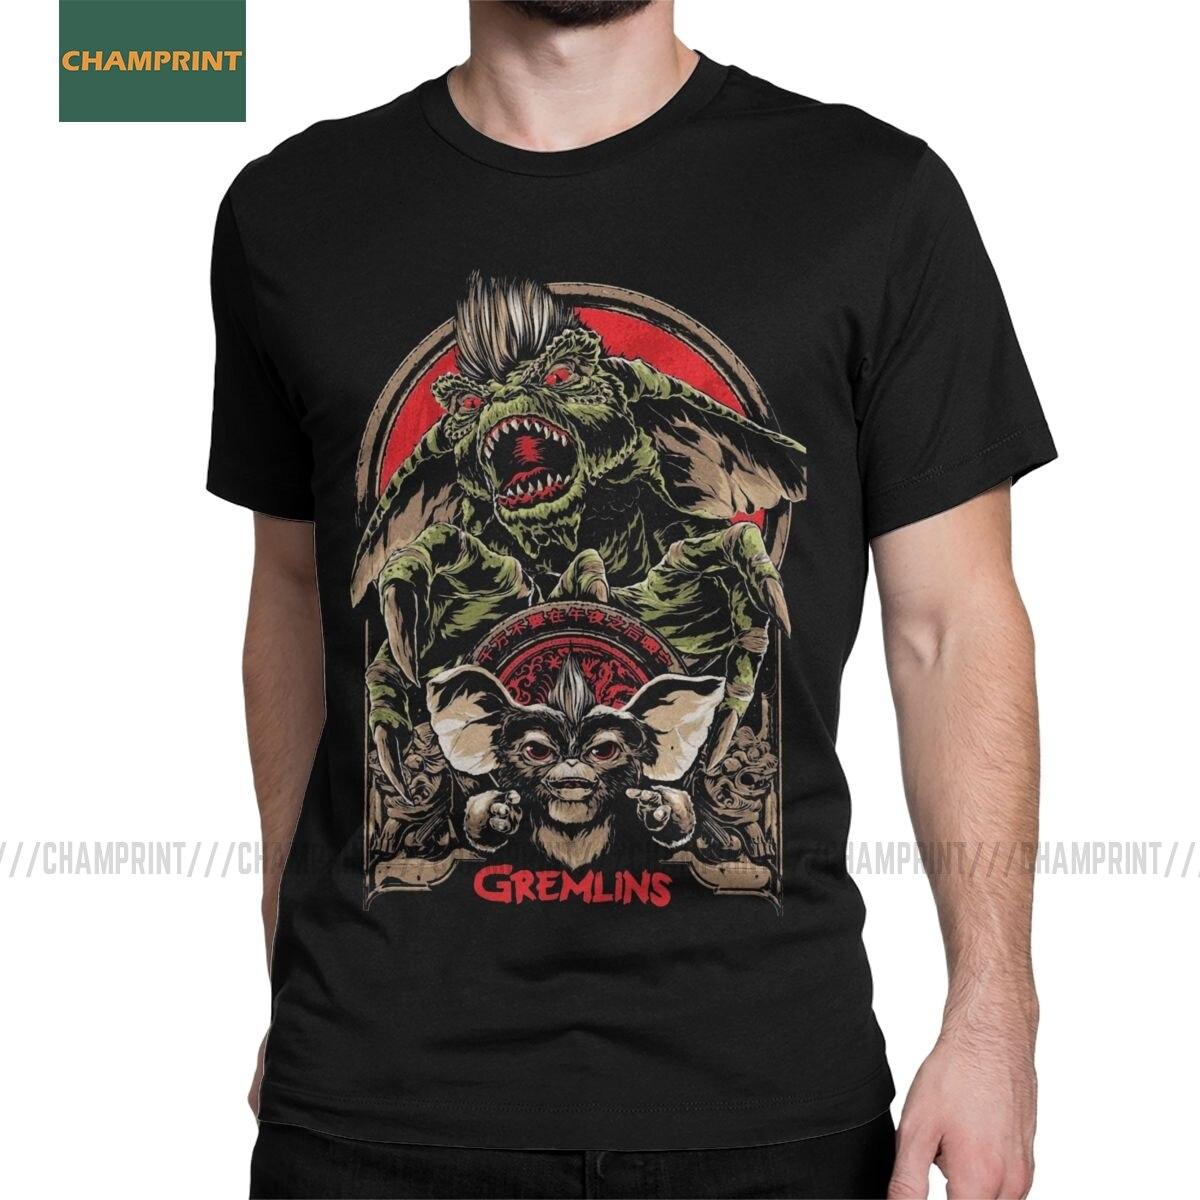 Gremlins Men's T Shirts Gizmo 80s Movie Mogwai Monster Horror Retro Sci Fi Creative Tees Short Sleeve T-Shirts Cotton 6XL